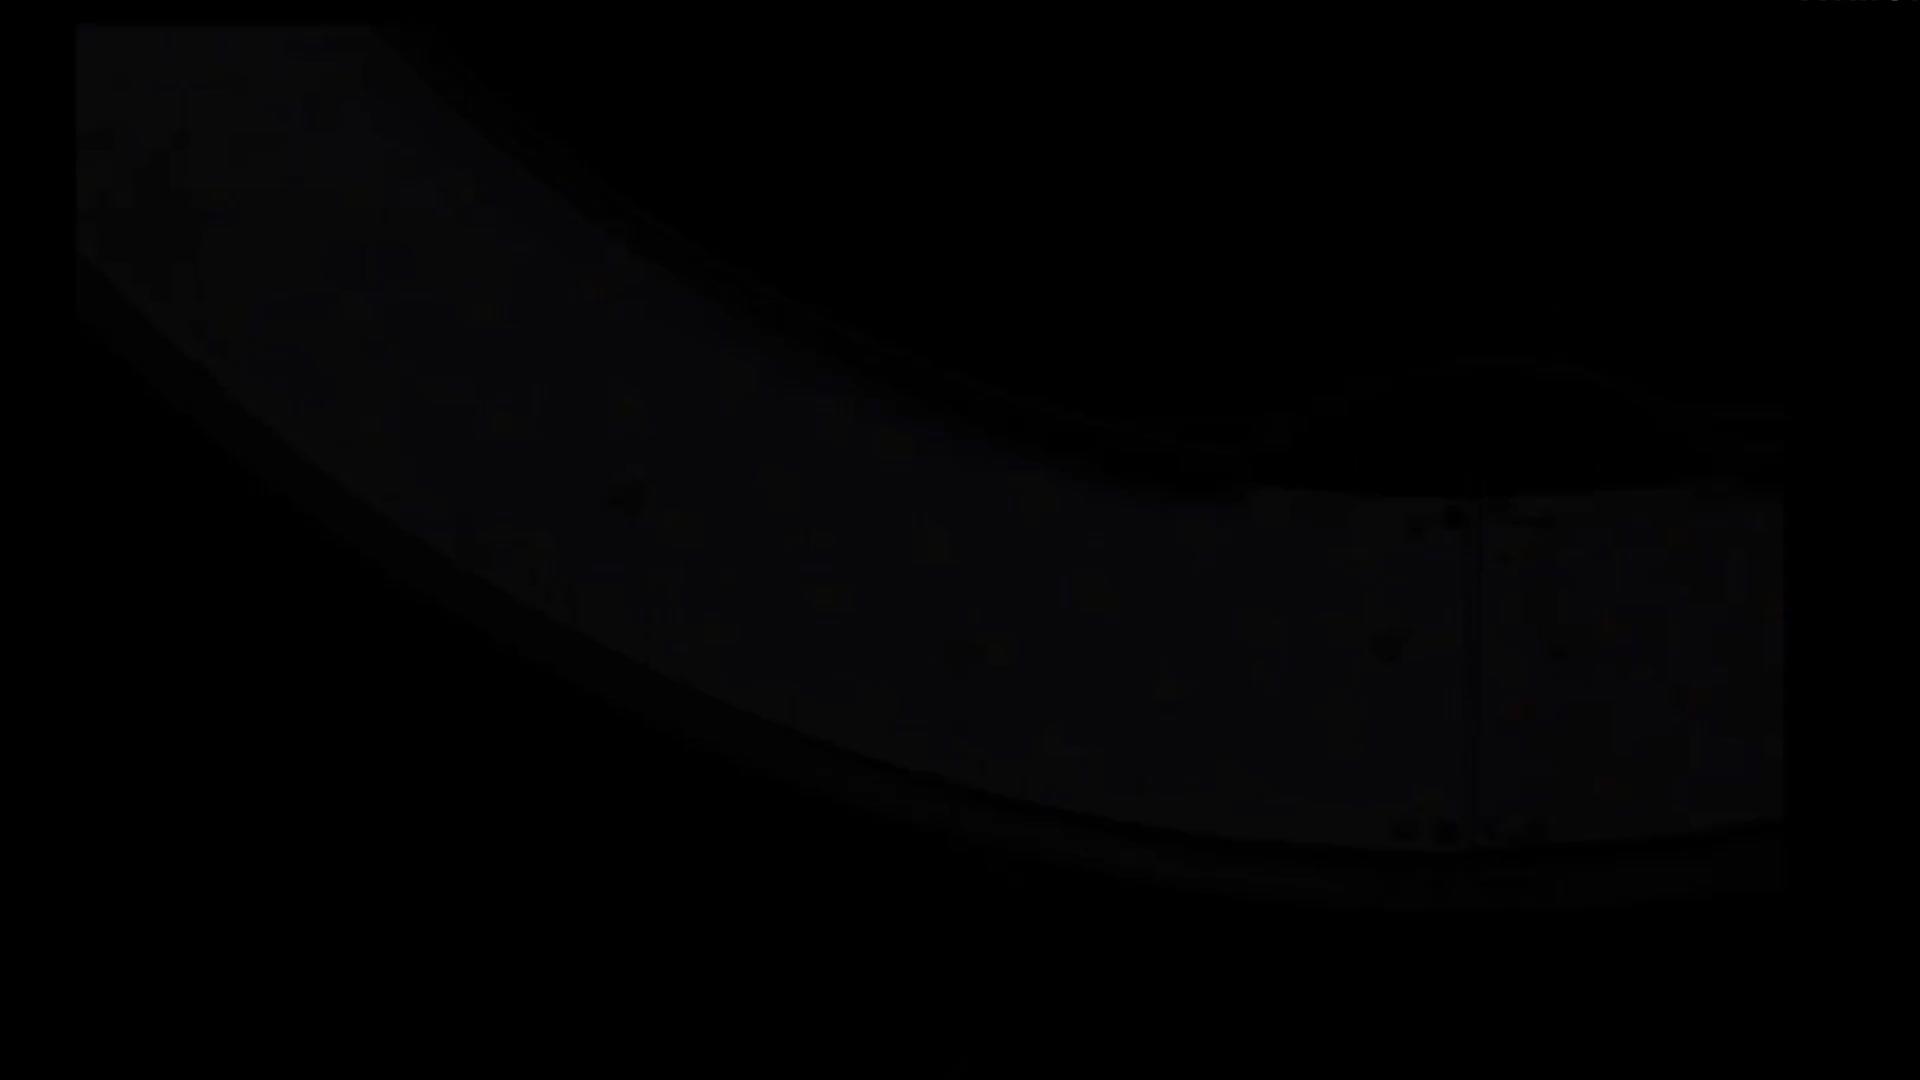 19 Inch LED Cincin Cahaya Kecantikan Makeup Lampu YouTube Blogger Vlogging Kit Studio Fotografi Cahaya